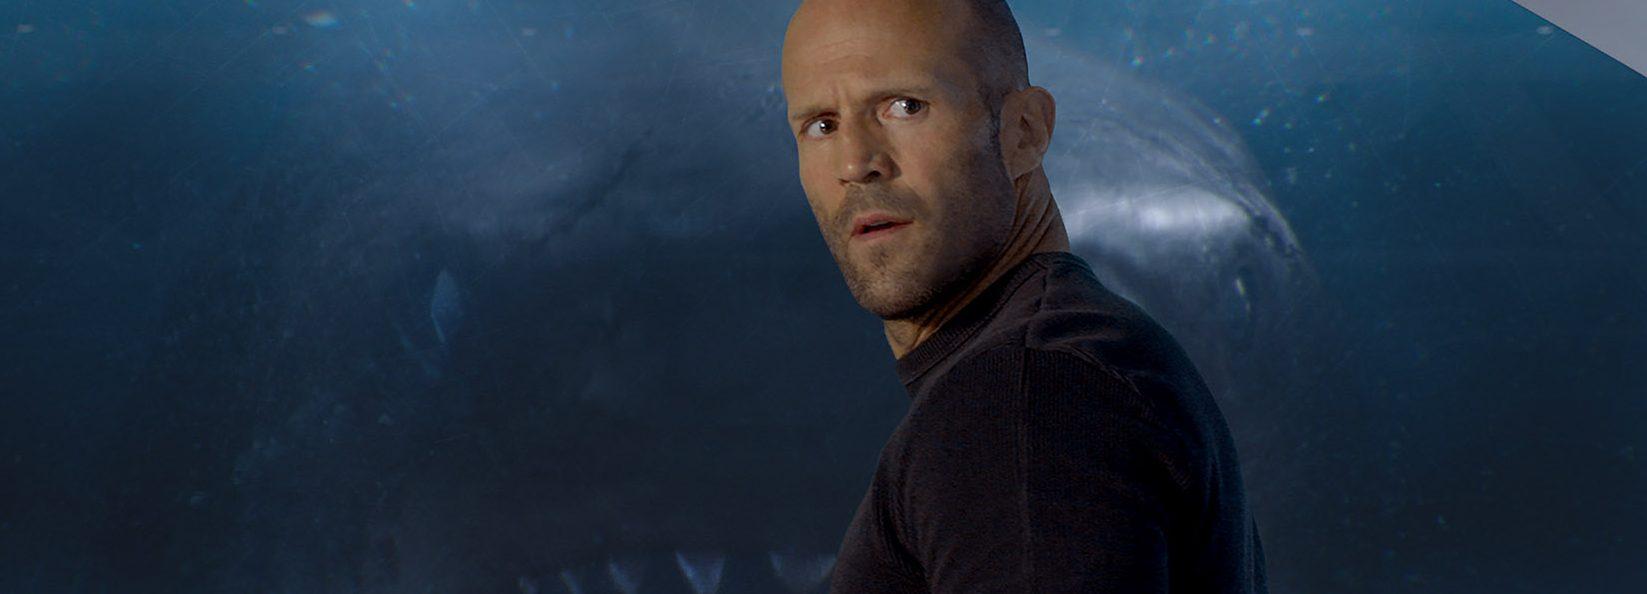 "Box Office Success of ""The Meg"" Proves Jason Statham Should Be Bigger Star"